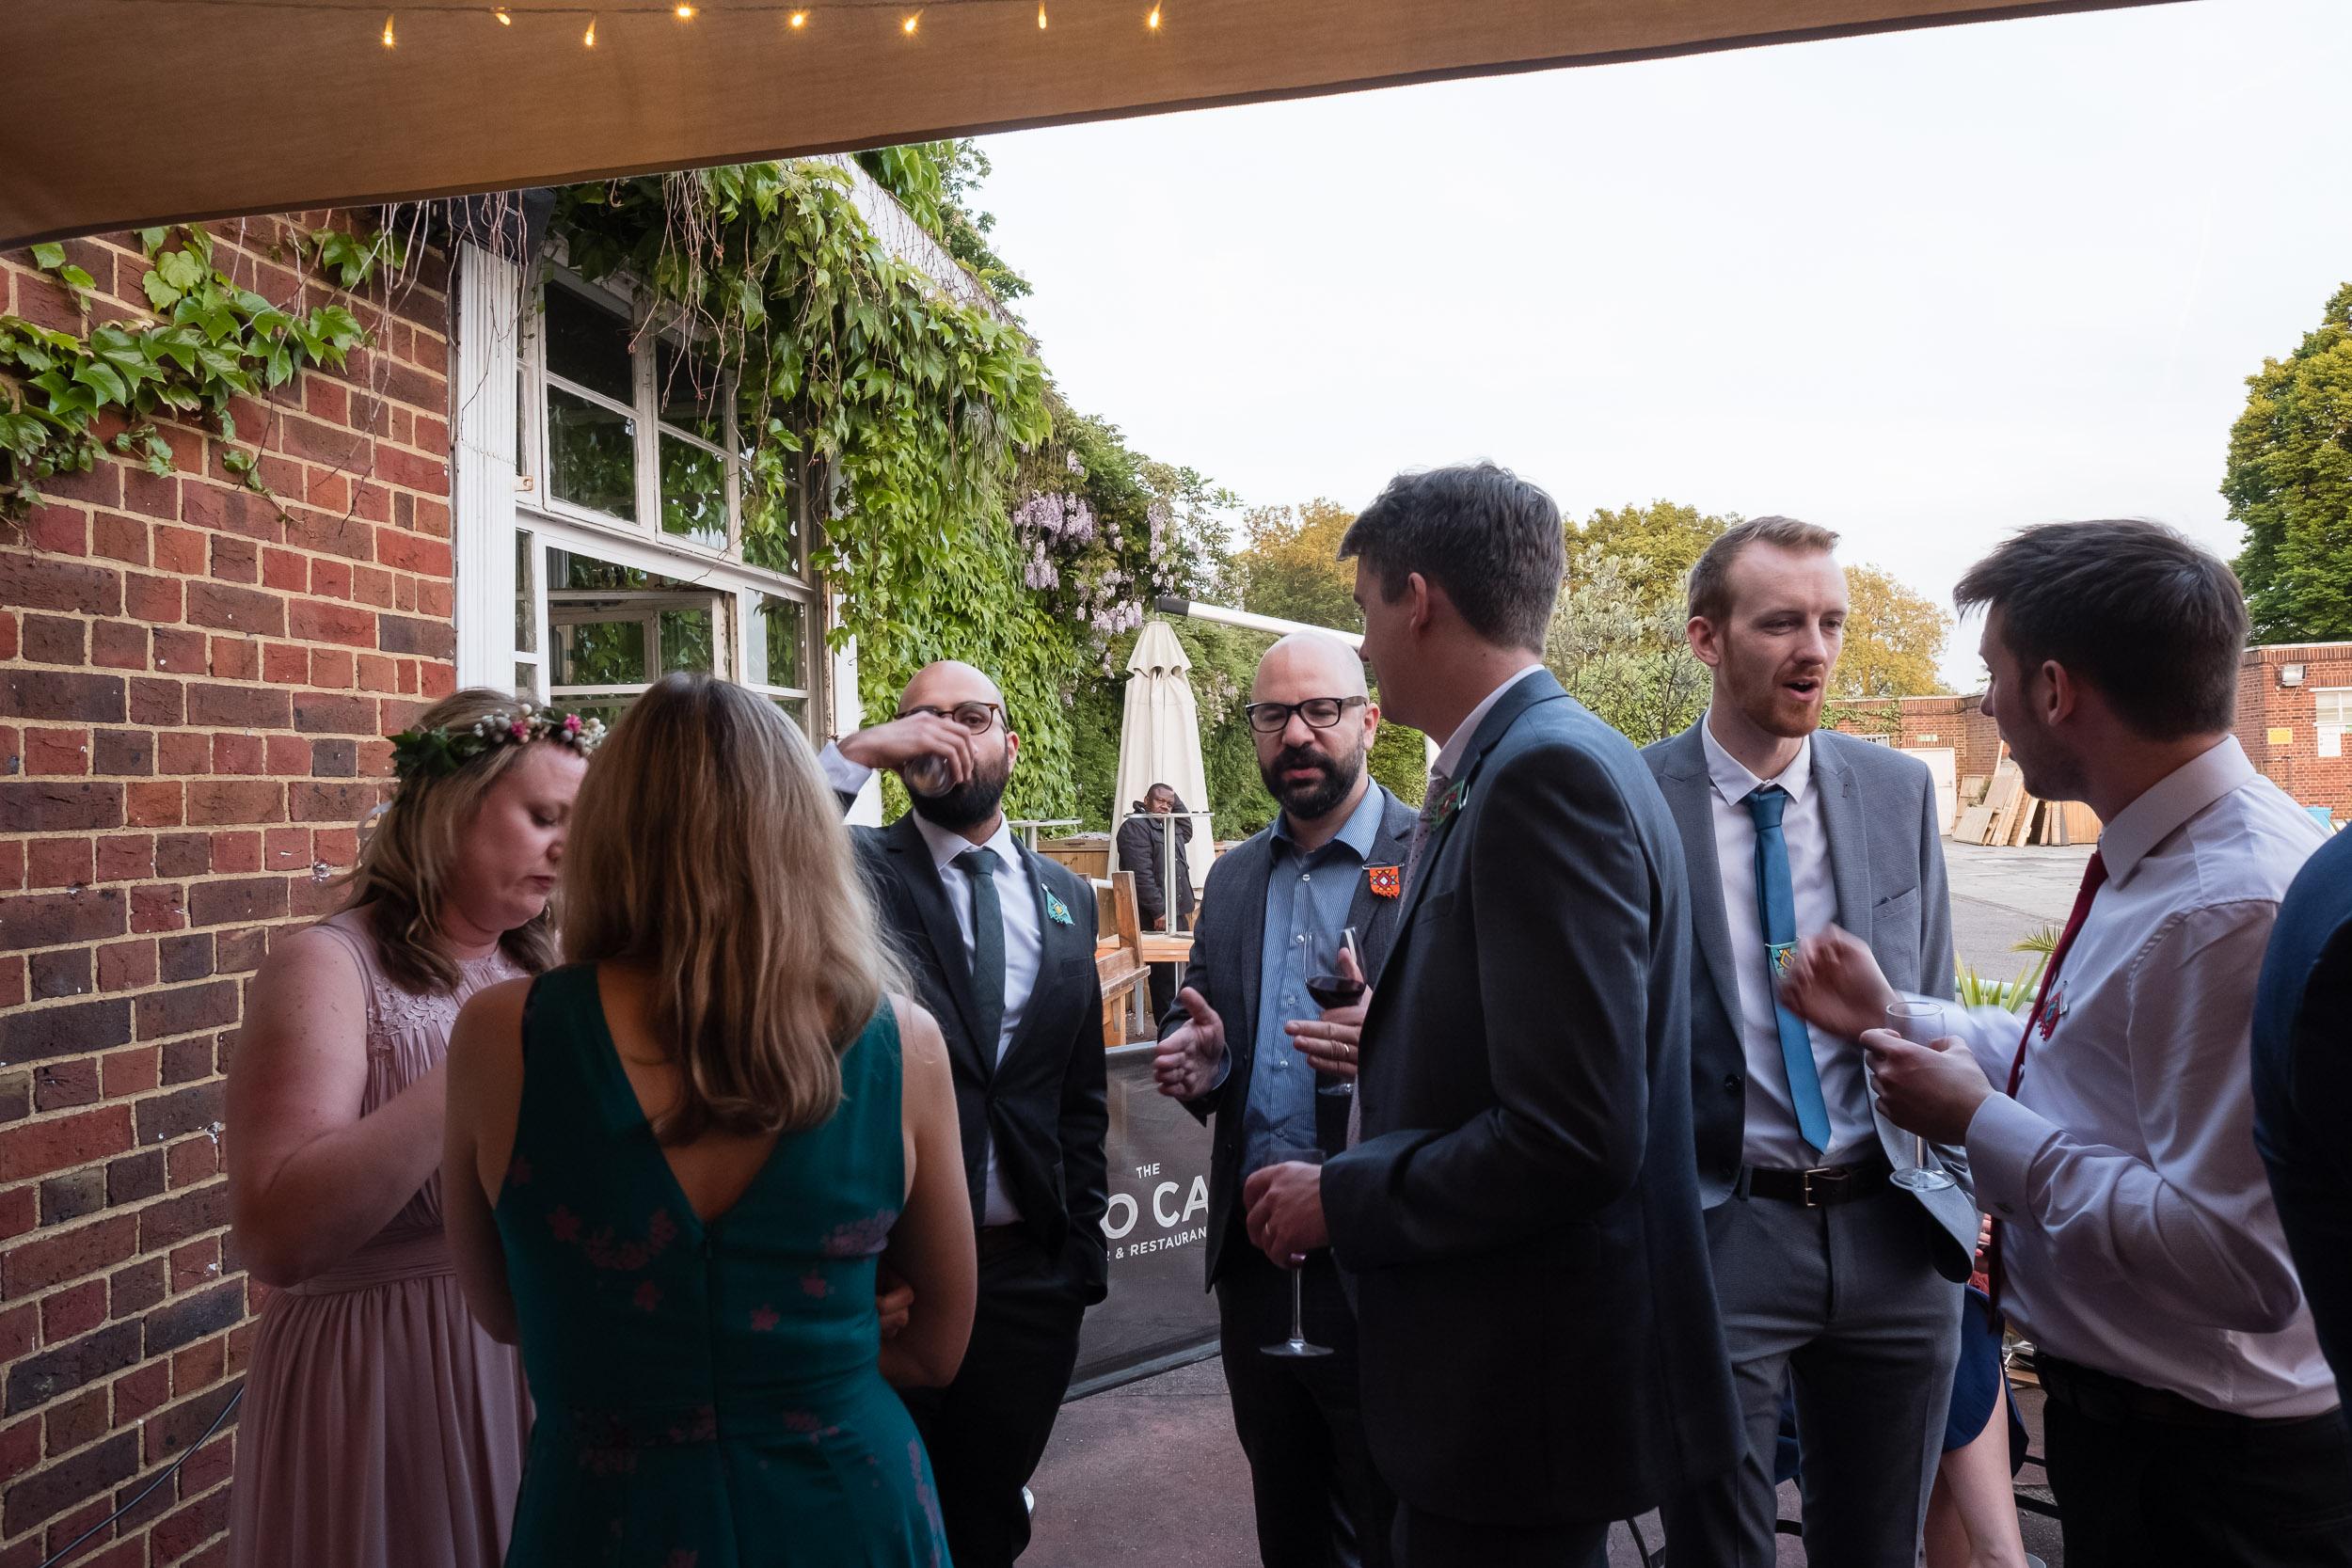 brockwell-lido-brixton-herne-hill-wedding-410.jpg